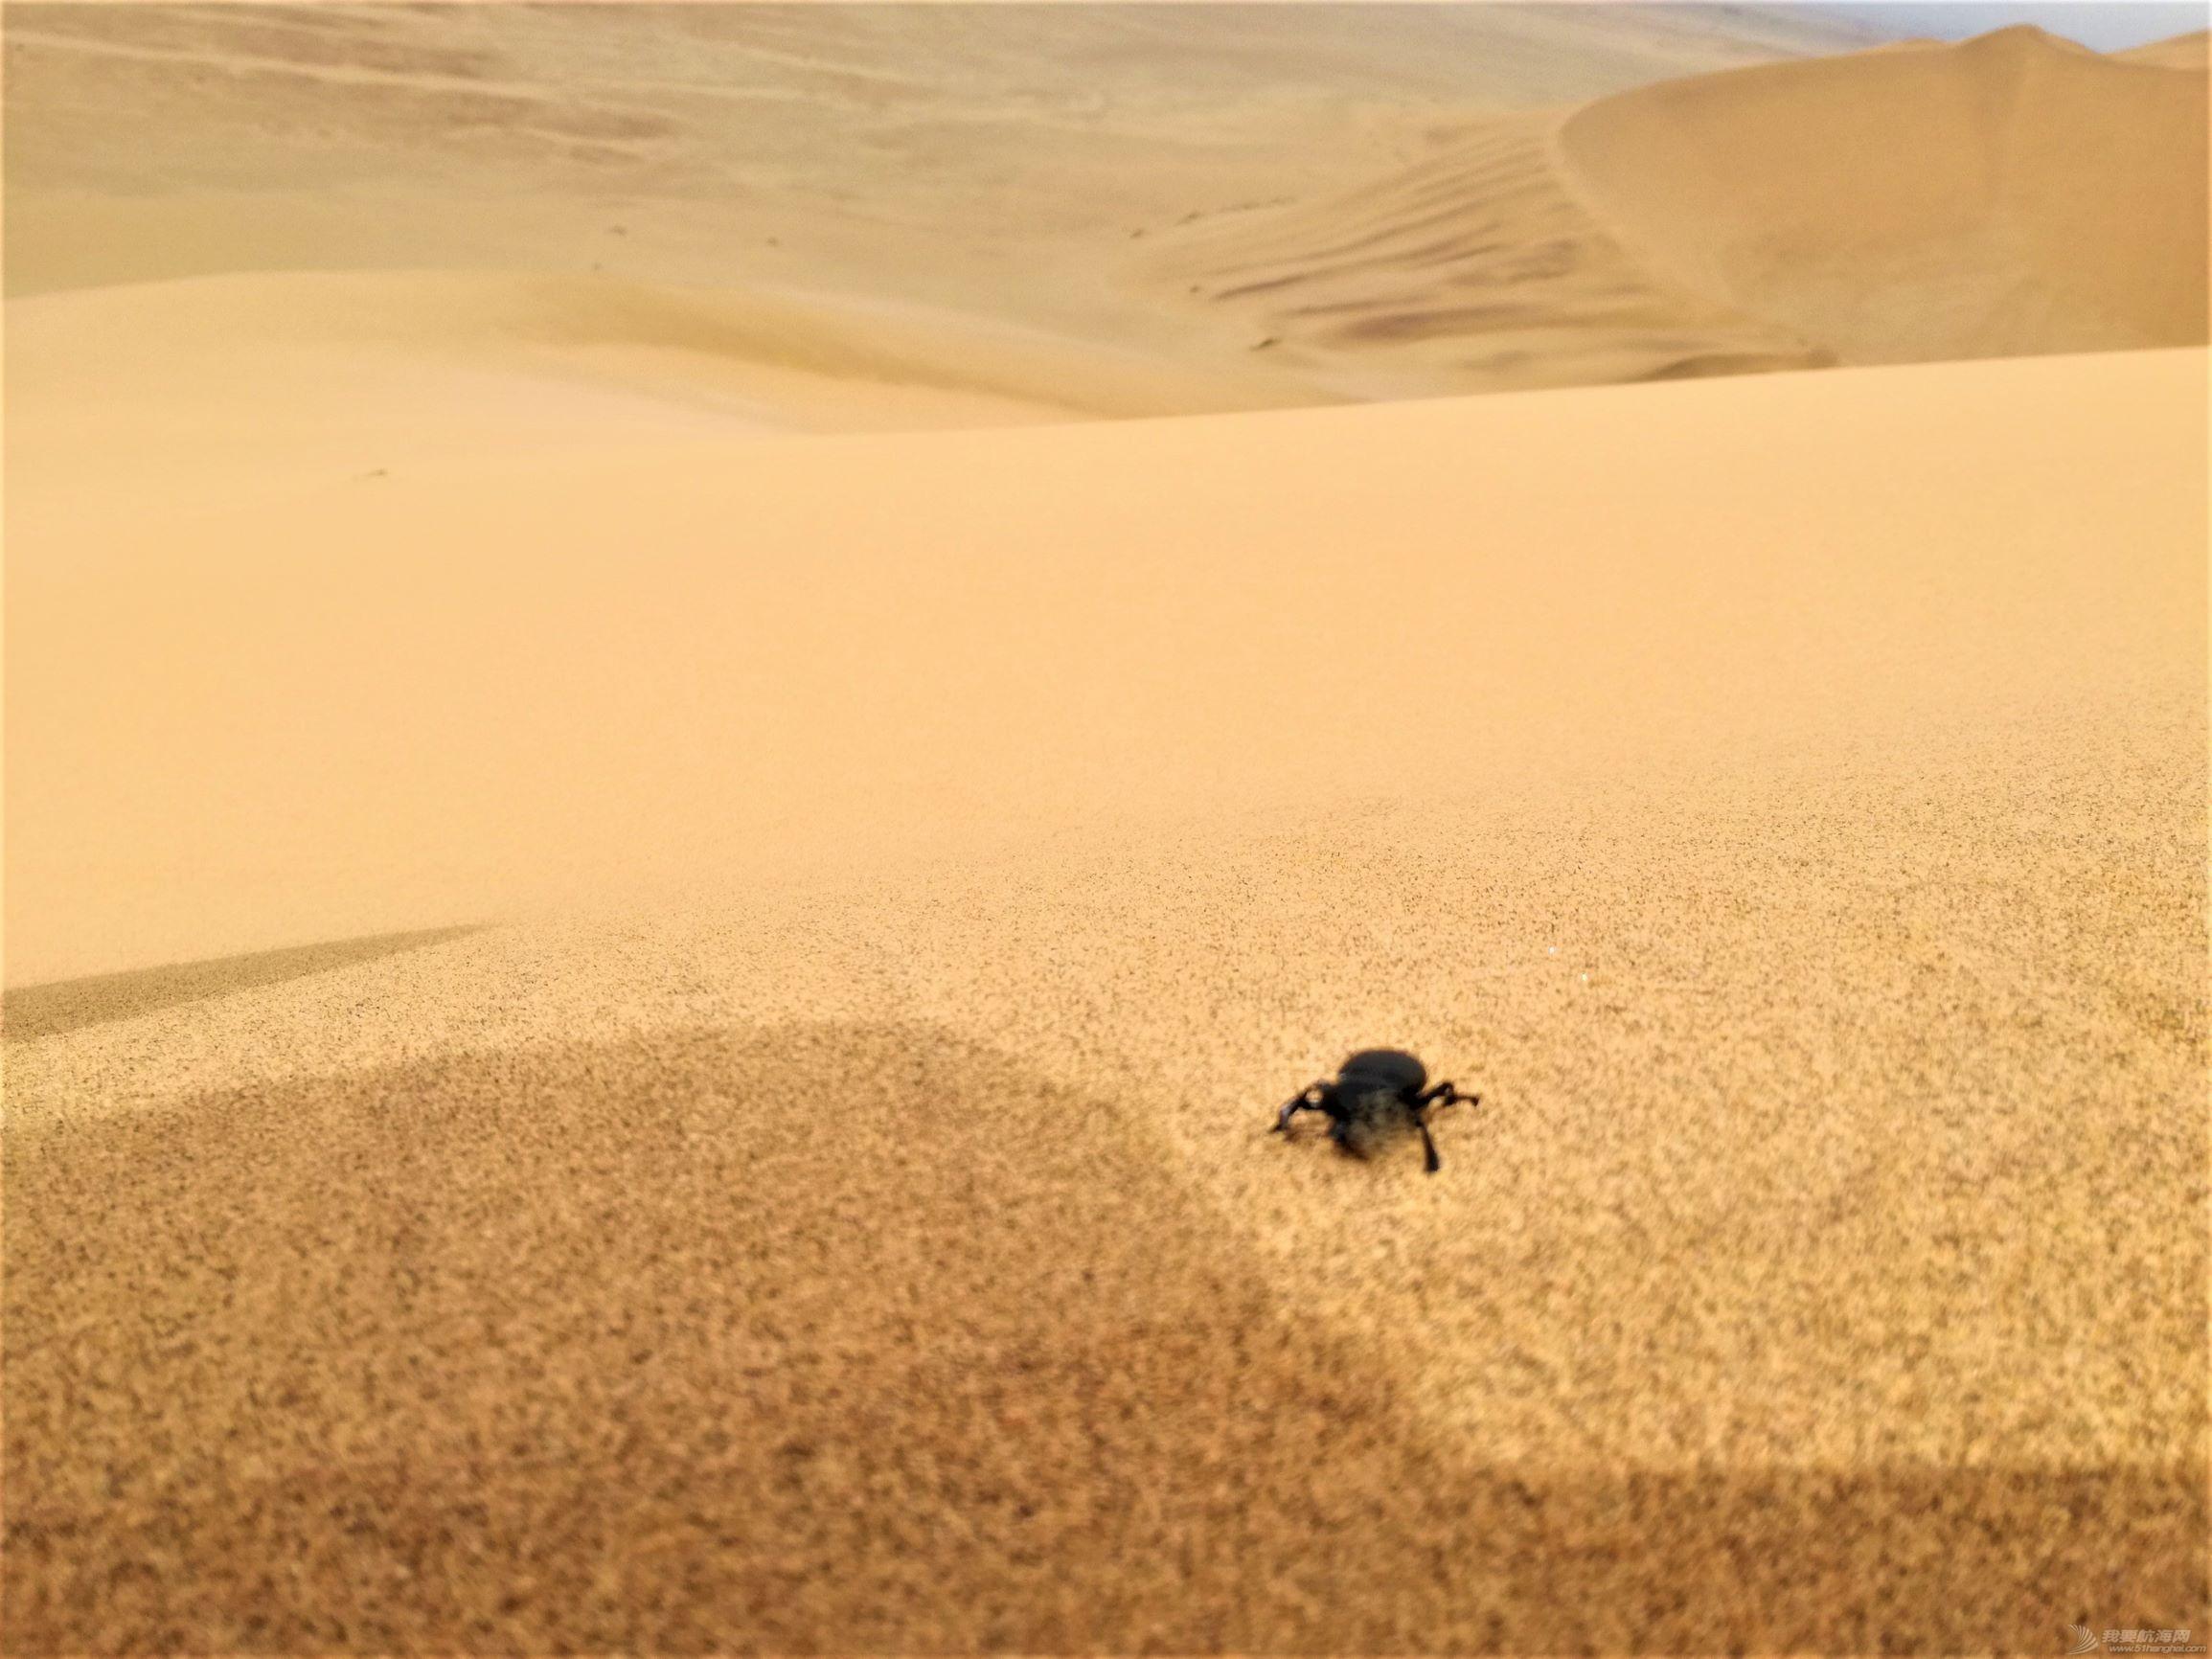 17 dune 7 a beetle.jpg